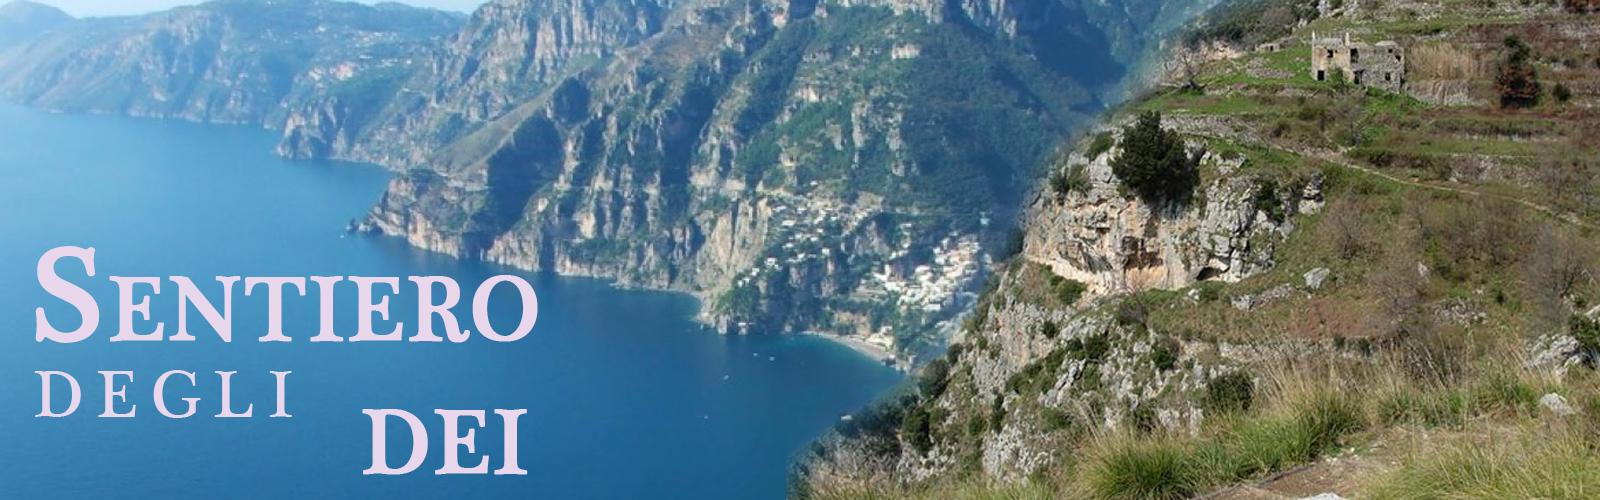 Vacanze Costiera Amalfitana-trekking sentiero degli dei